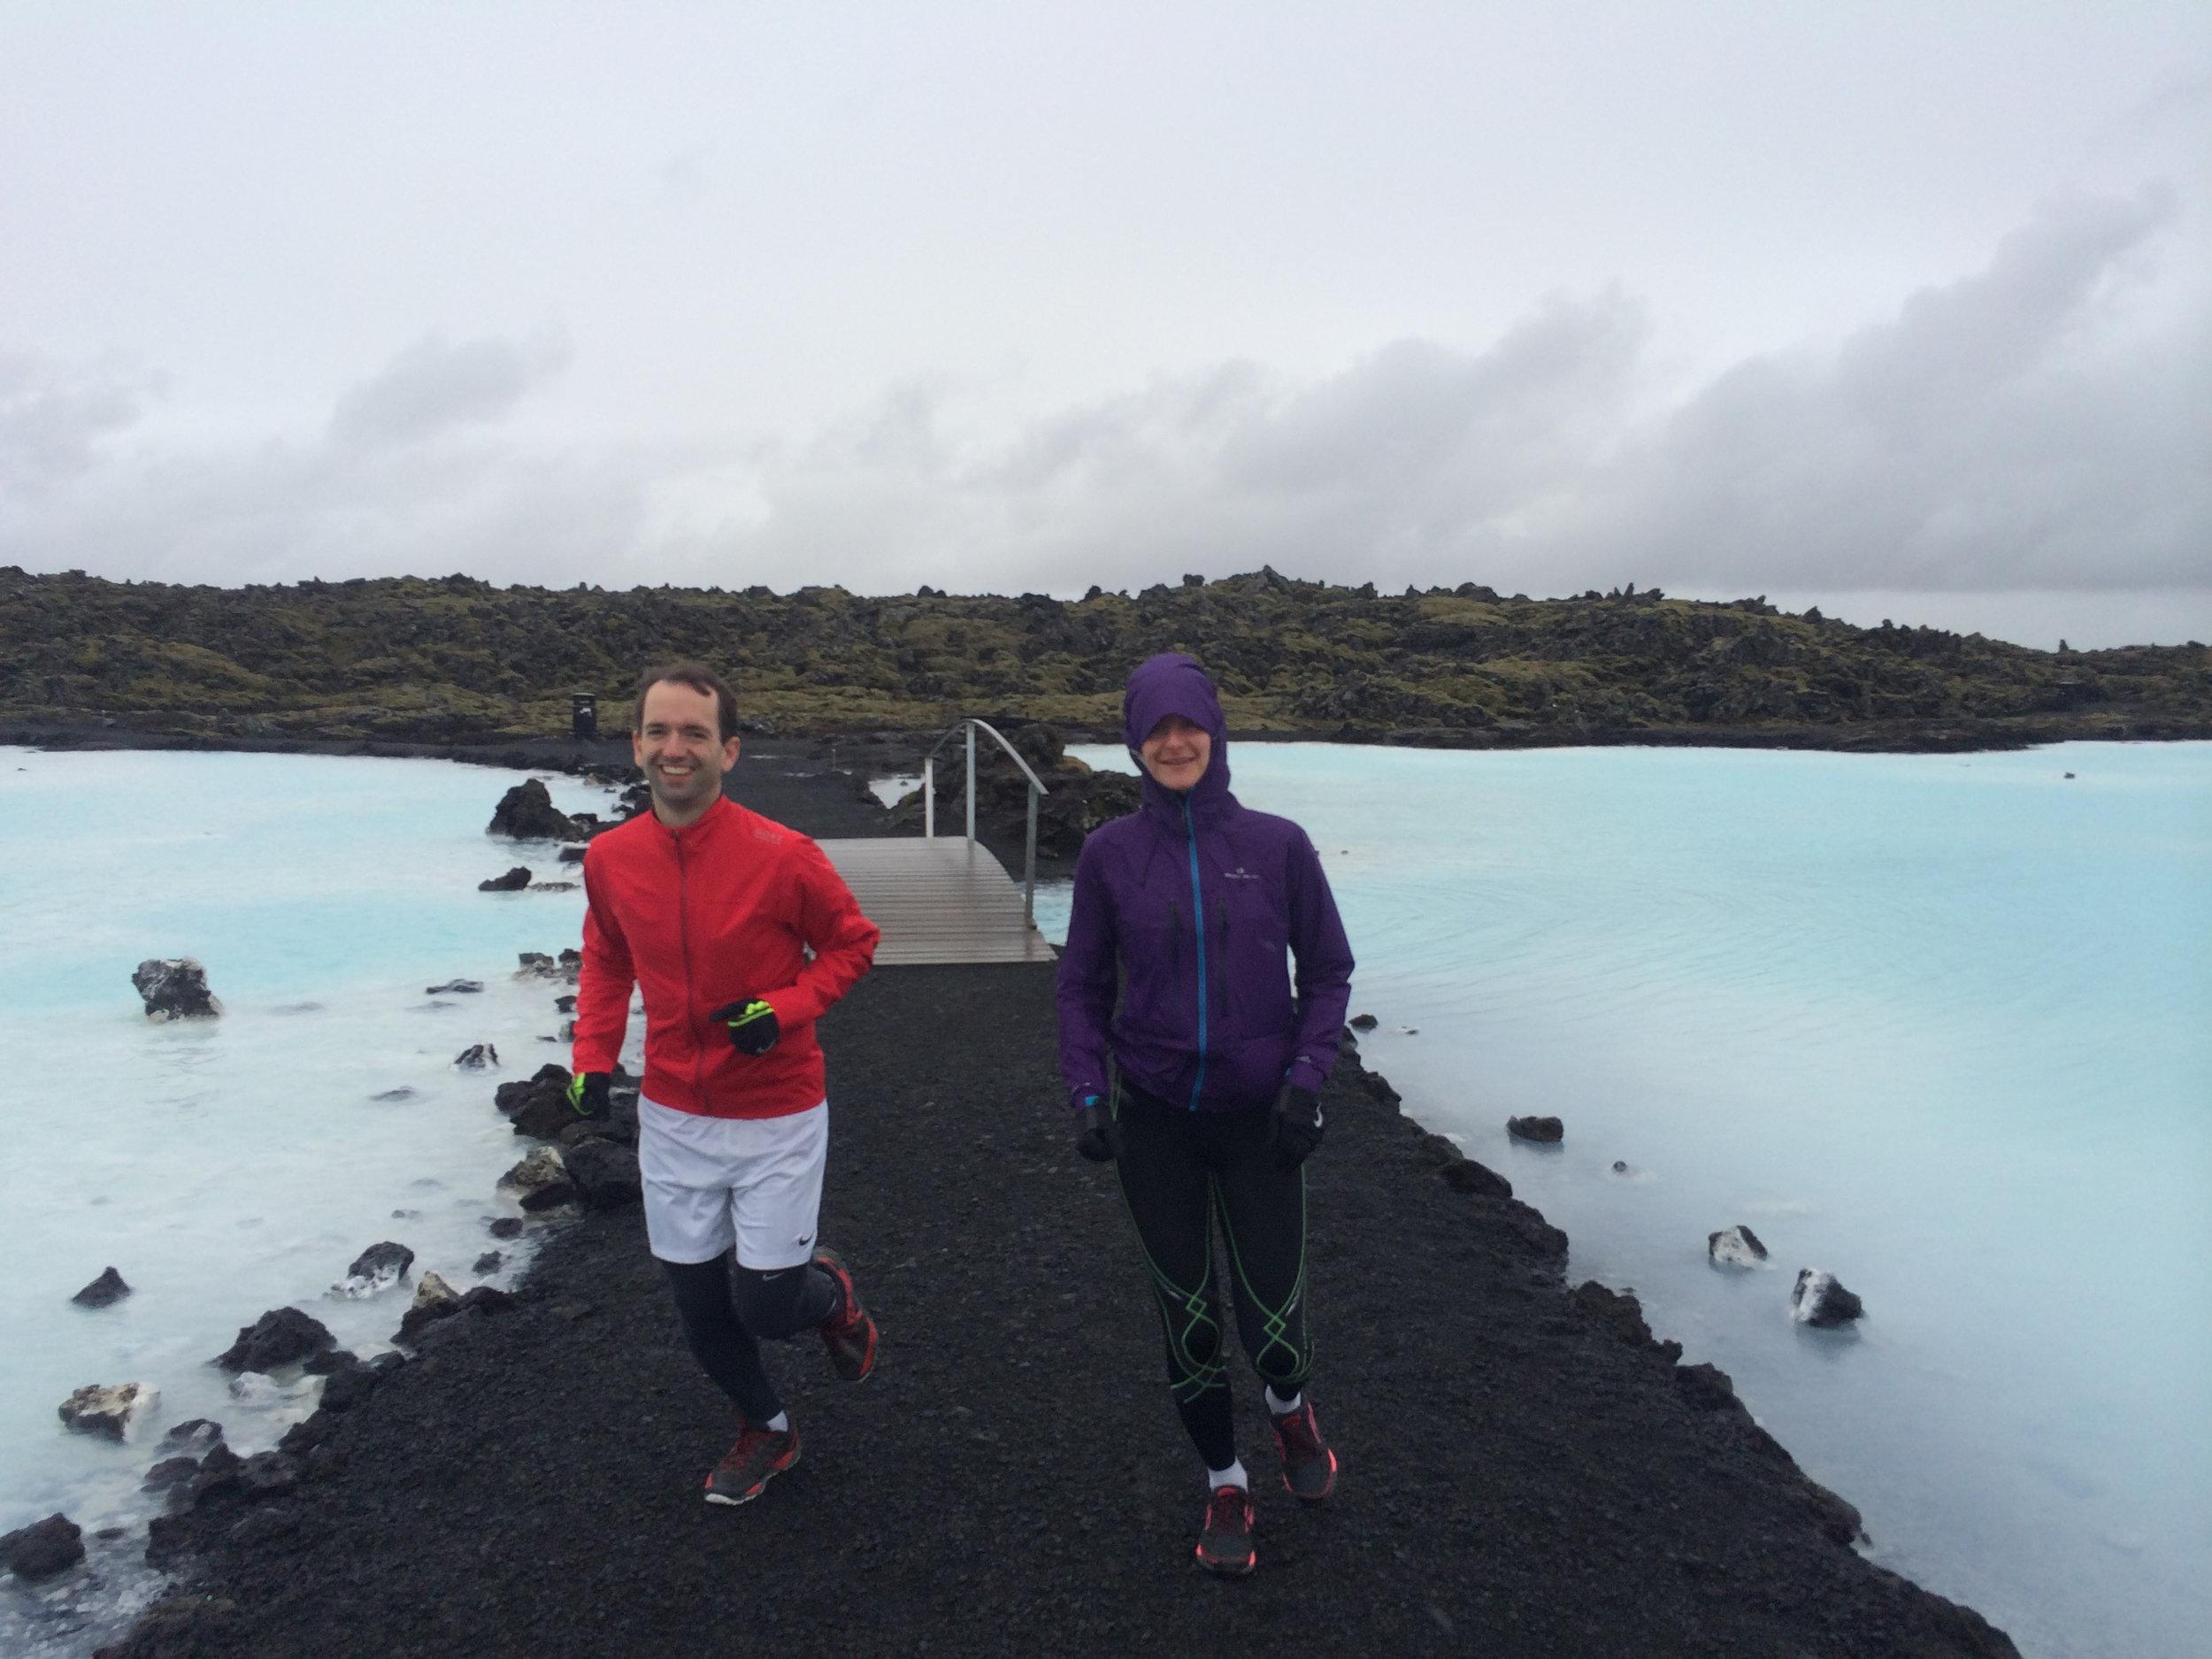 Iceland adventure running retreat     Fun run through a lava field